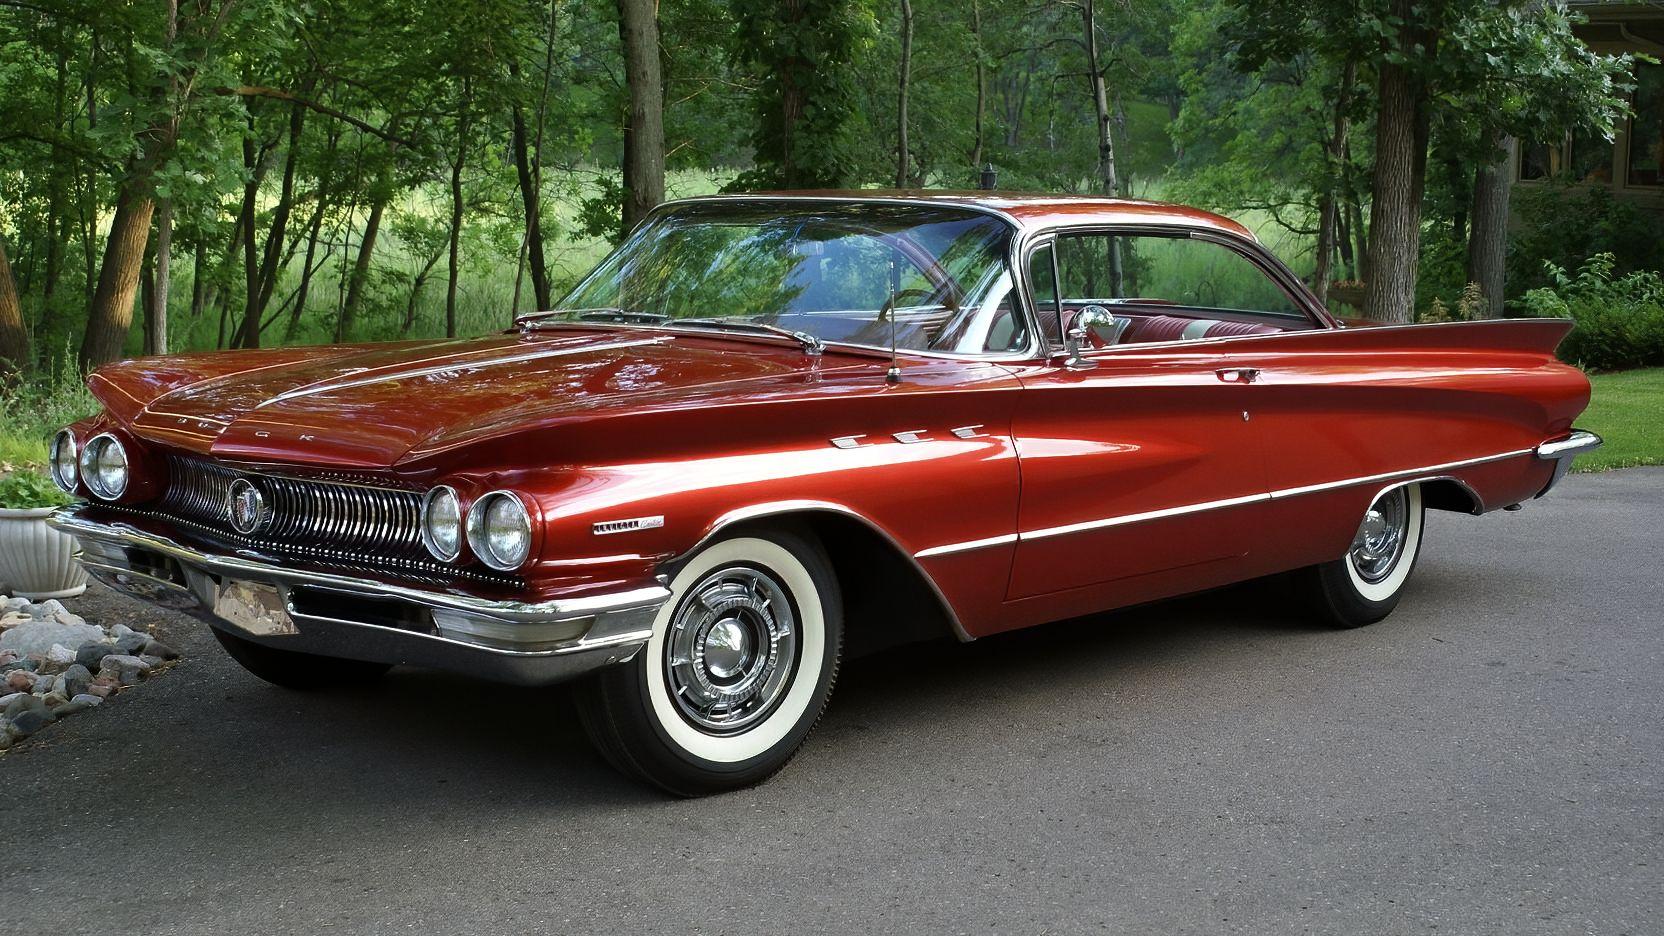 1960 Buick Invicta Custom Hardtop